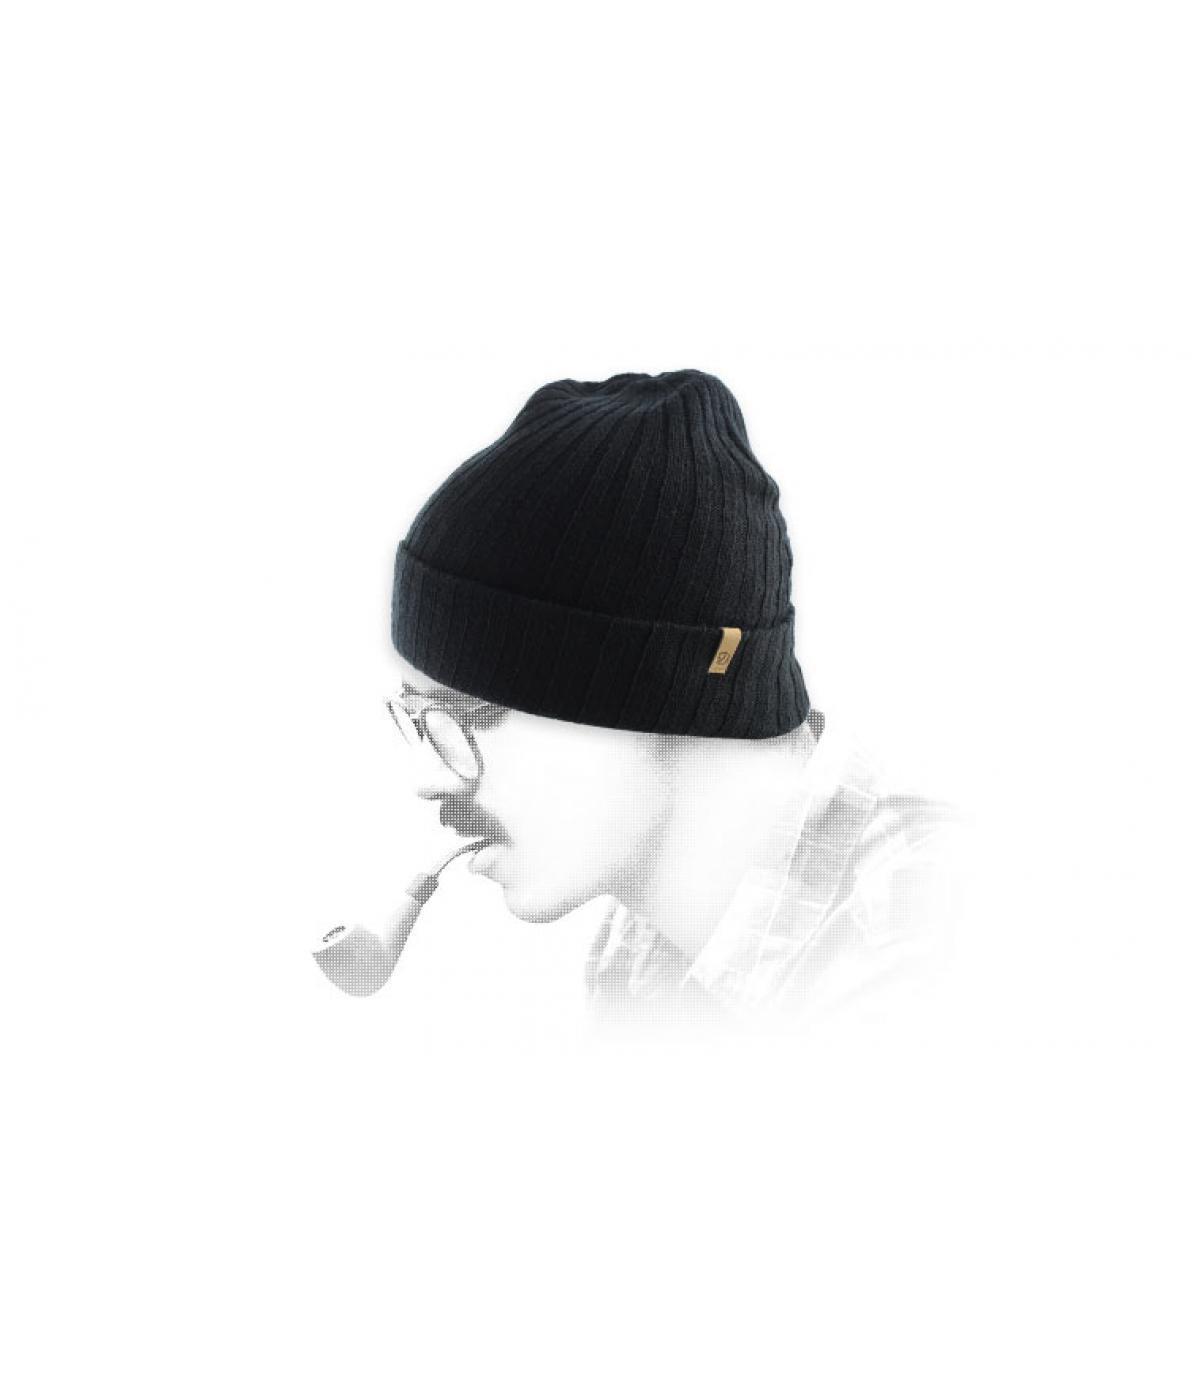 bonnet revers noir Fjällräven